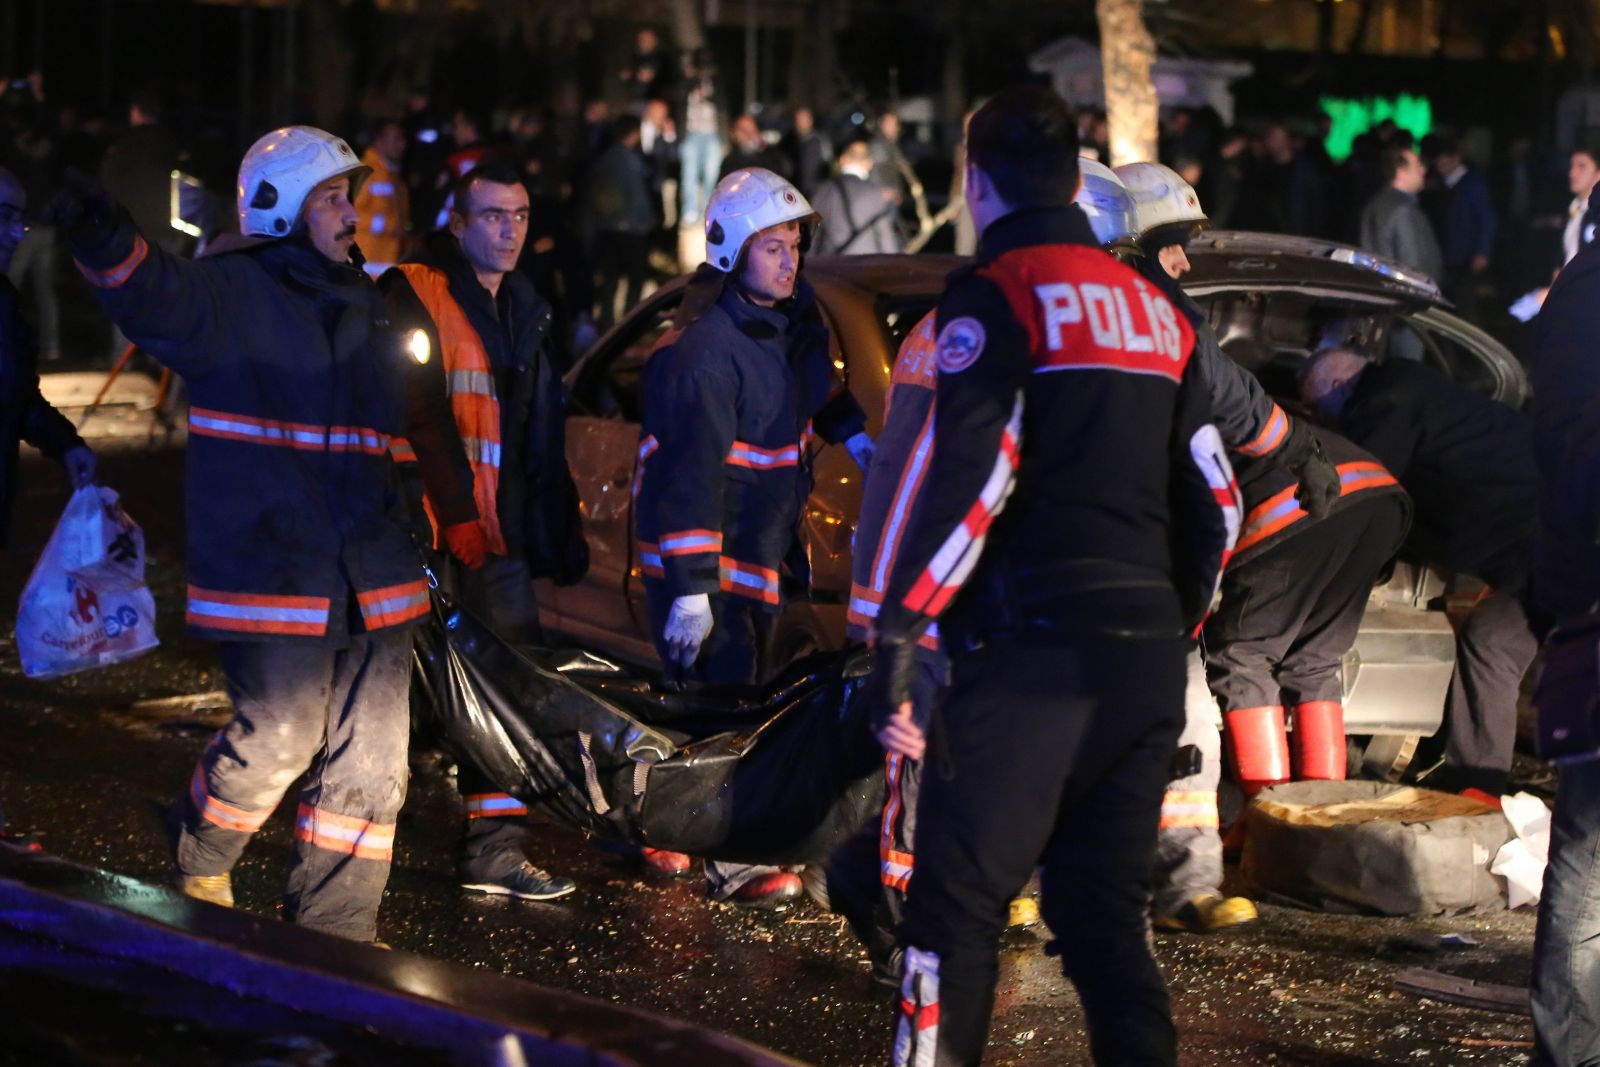 - turkey bklast - MJC offers condolences and prays to the people of Turkey